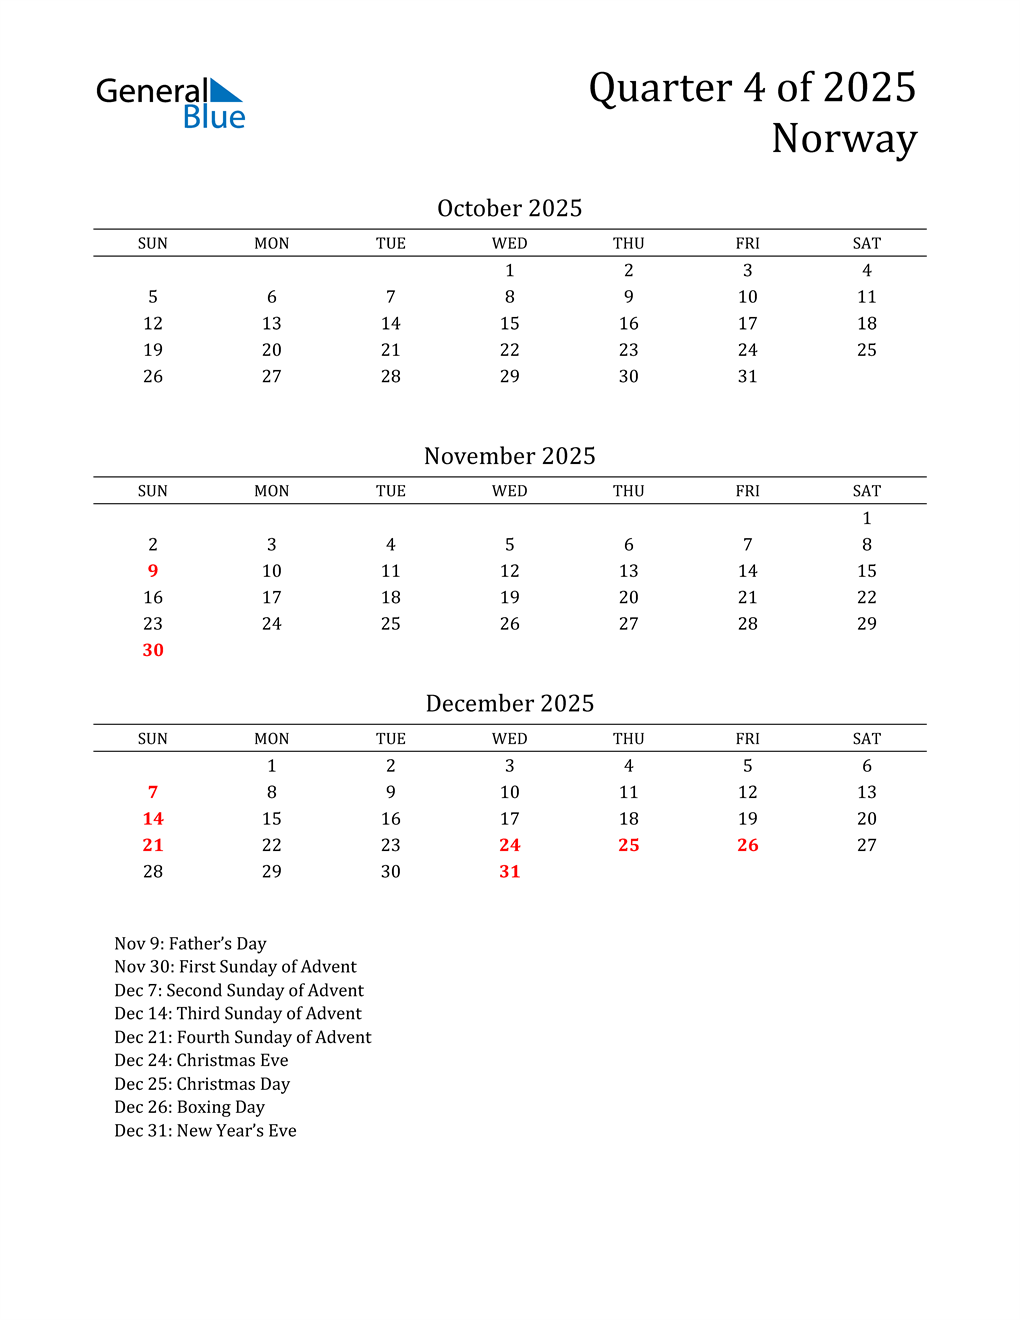 2025 Norway Quarterly Calendar